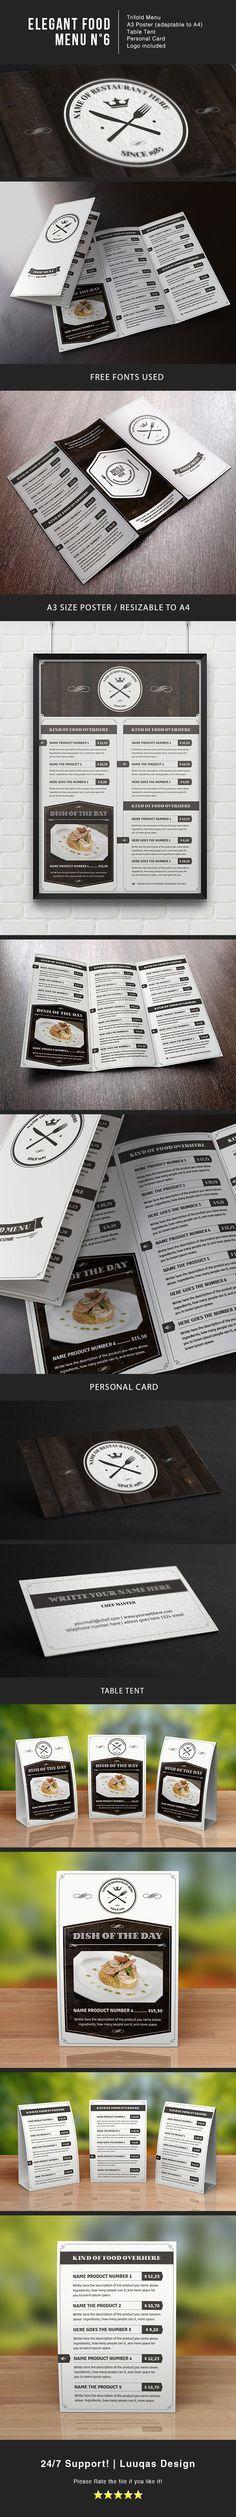 restaurant menu logo graphic elements wwwcheap-logo-designuk